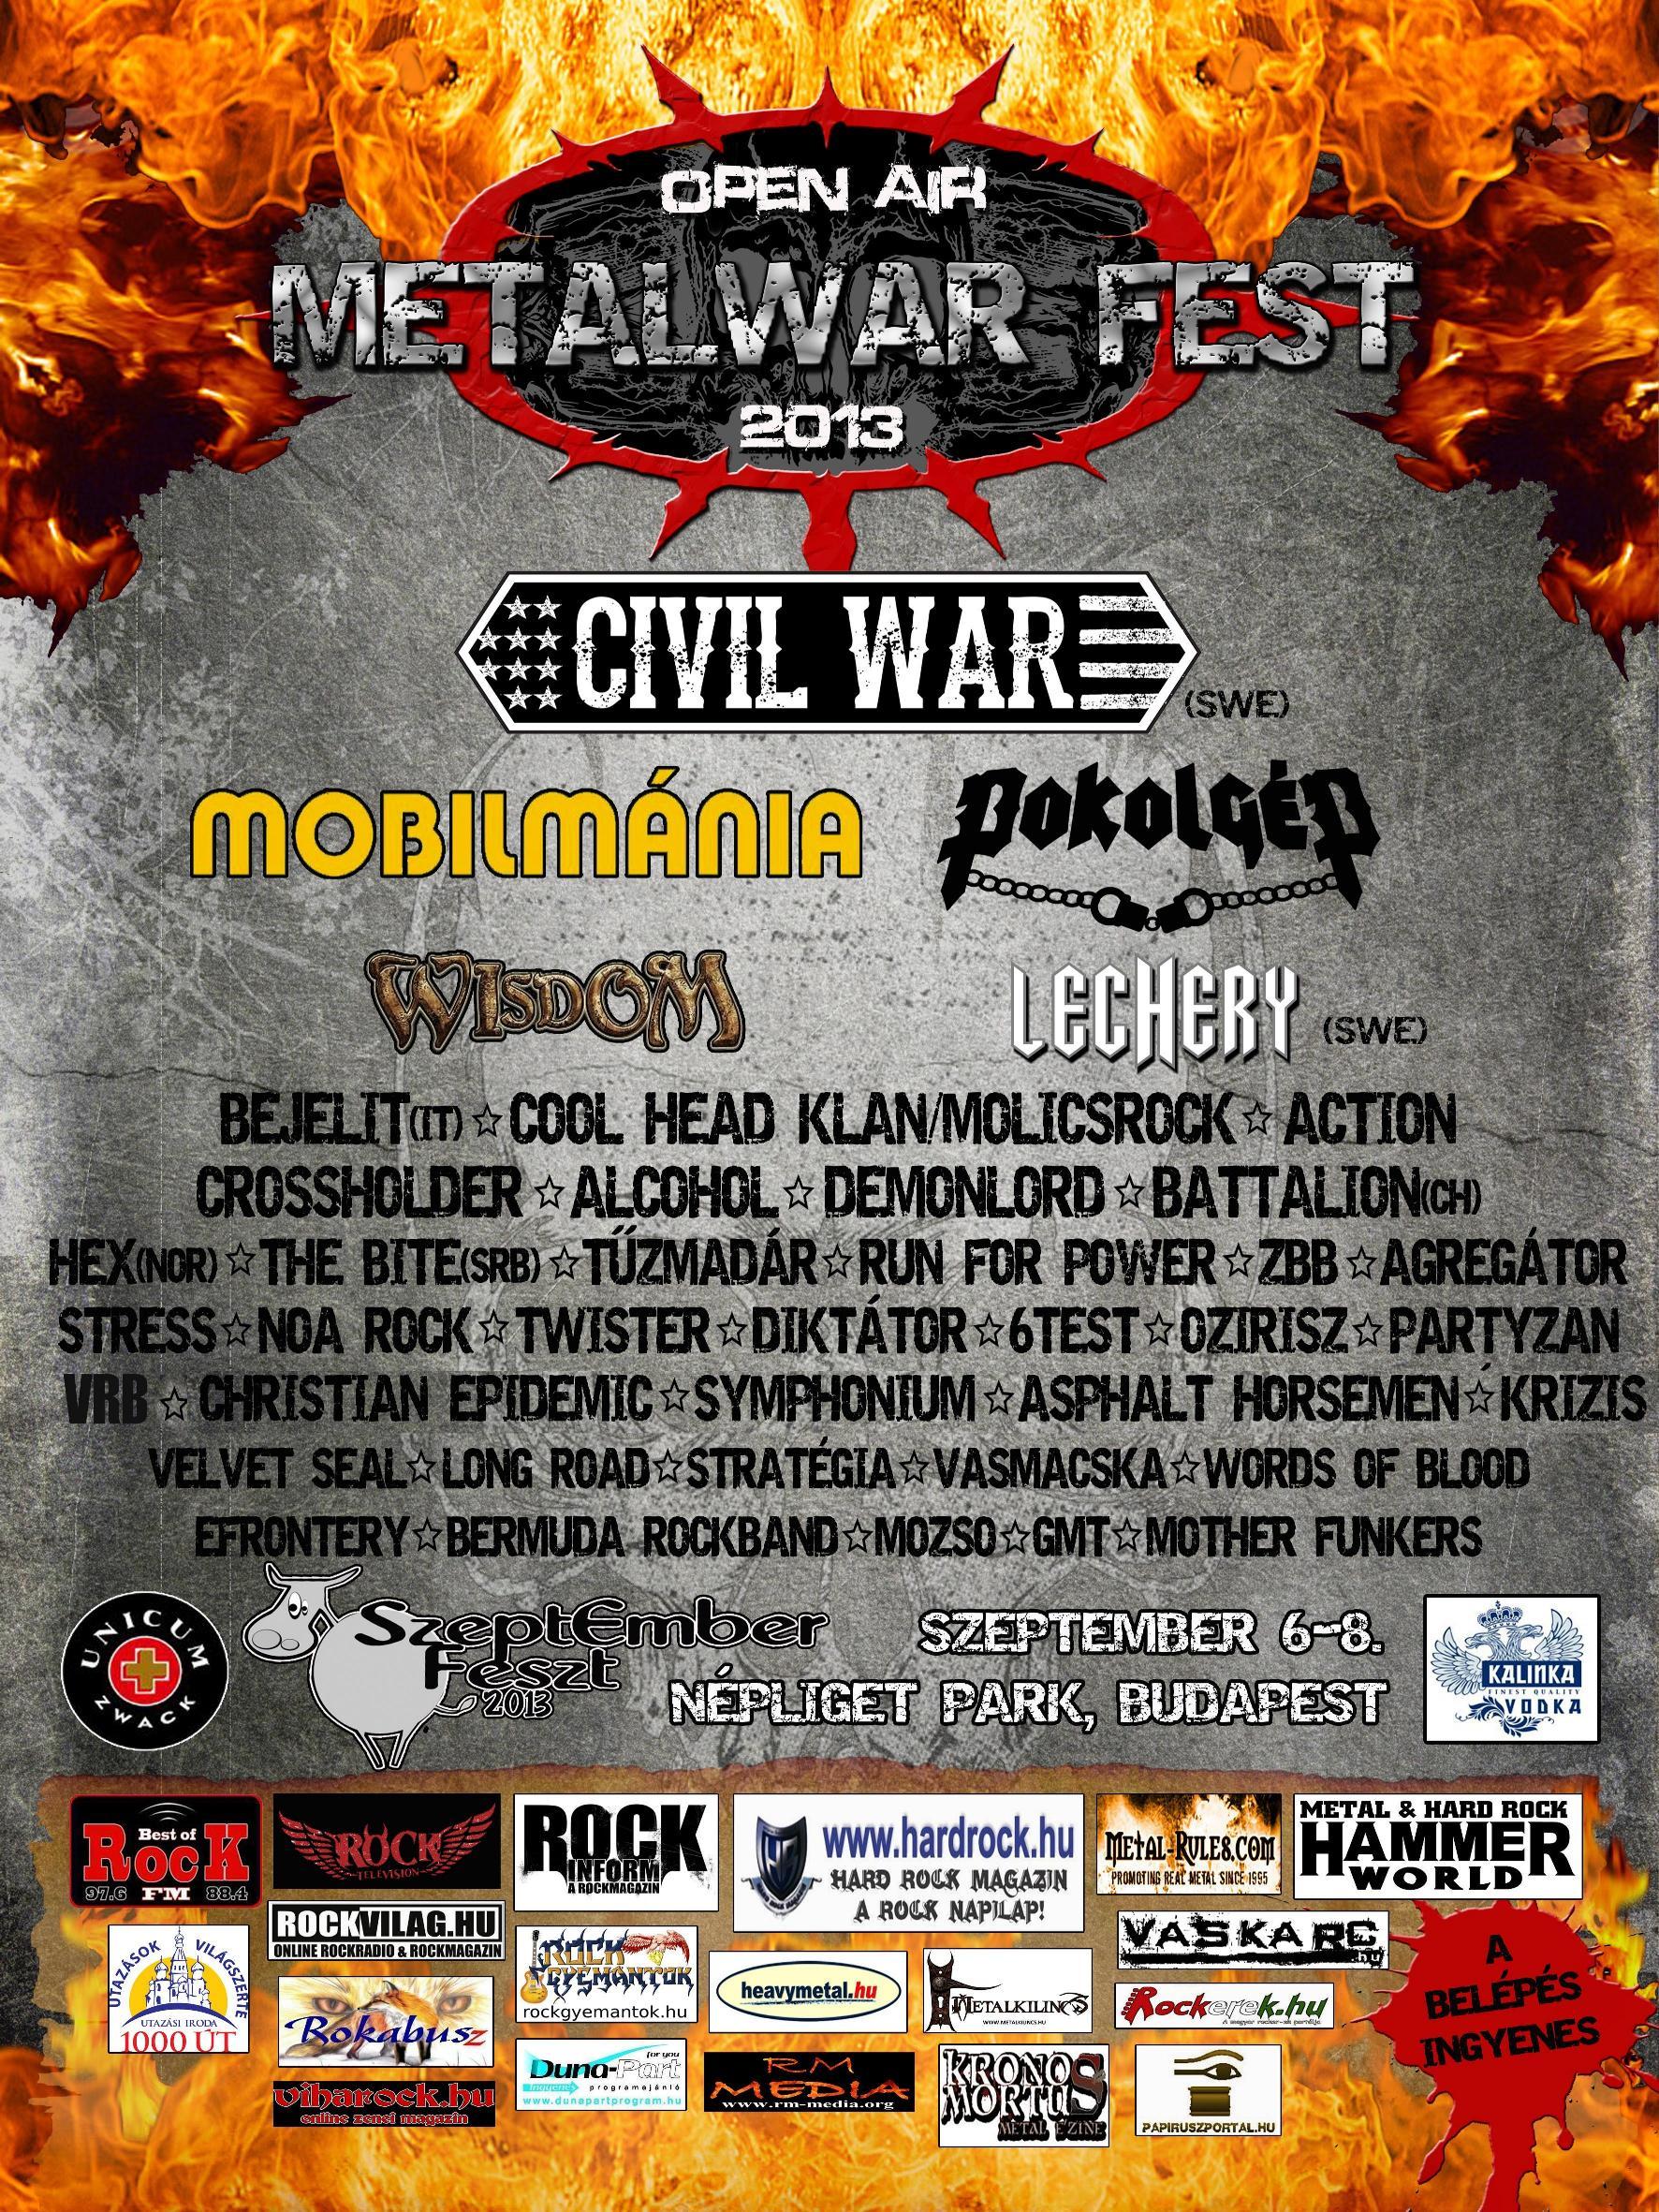 Metalwar fest 2013